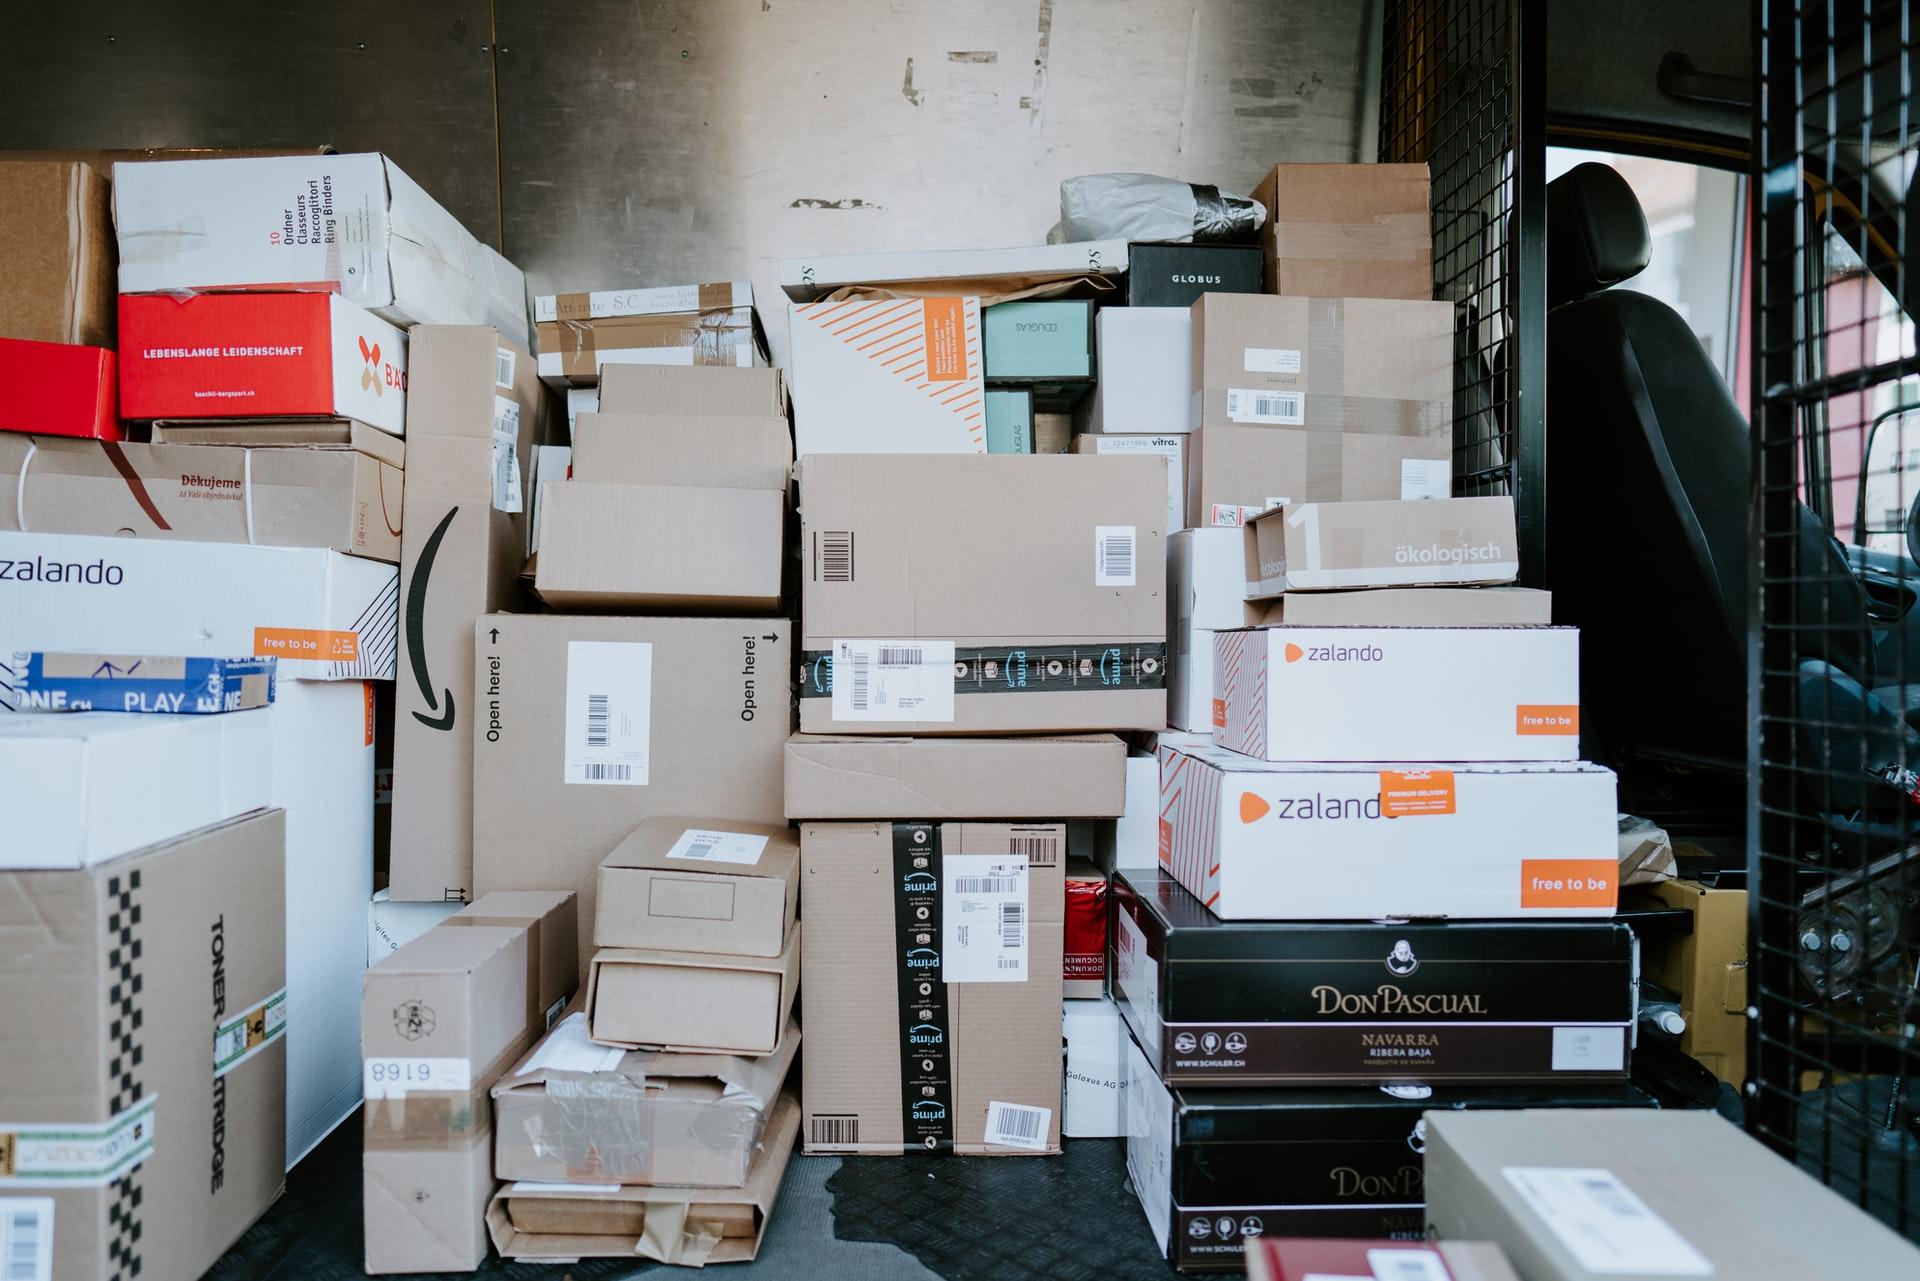 better logistics management